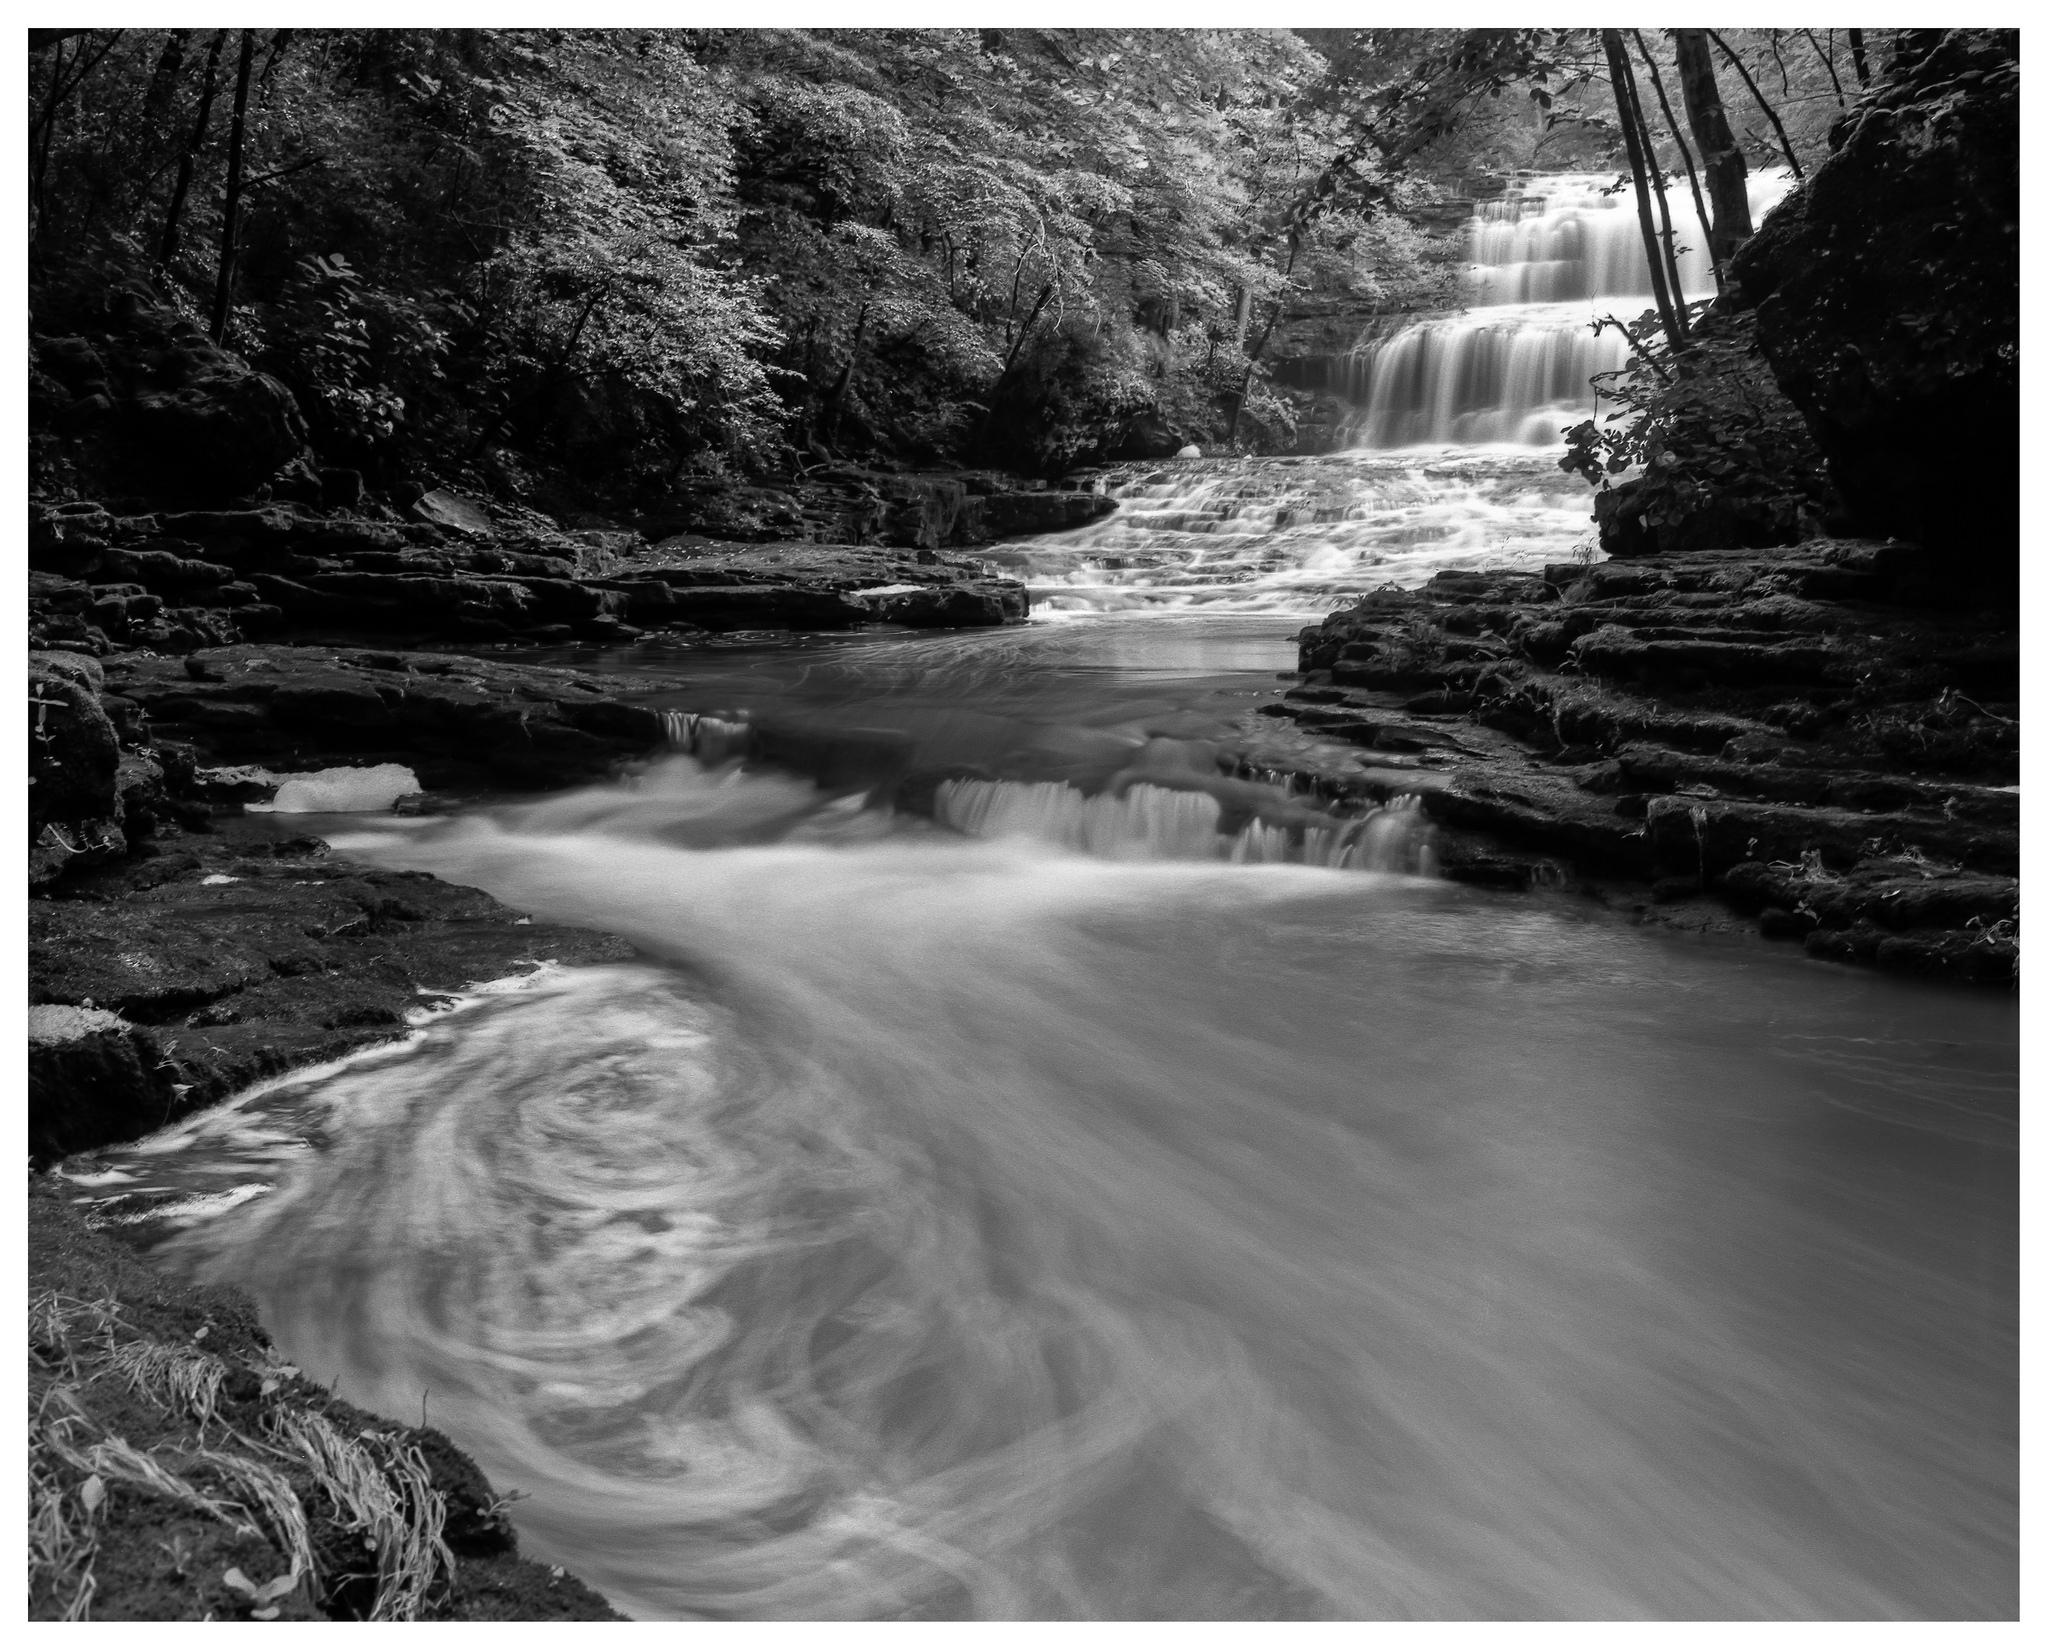 Fallsville Falls – Mamiya RB67 ProS w/50mm lens, polarizer, and 4-stop ND filter on Kodak Tmax 100 film @ f/16, 60 seconds